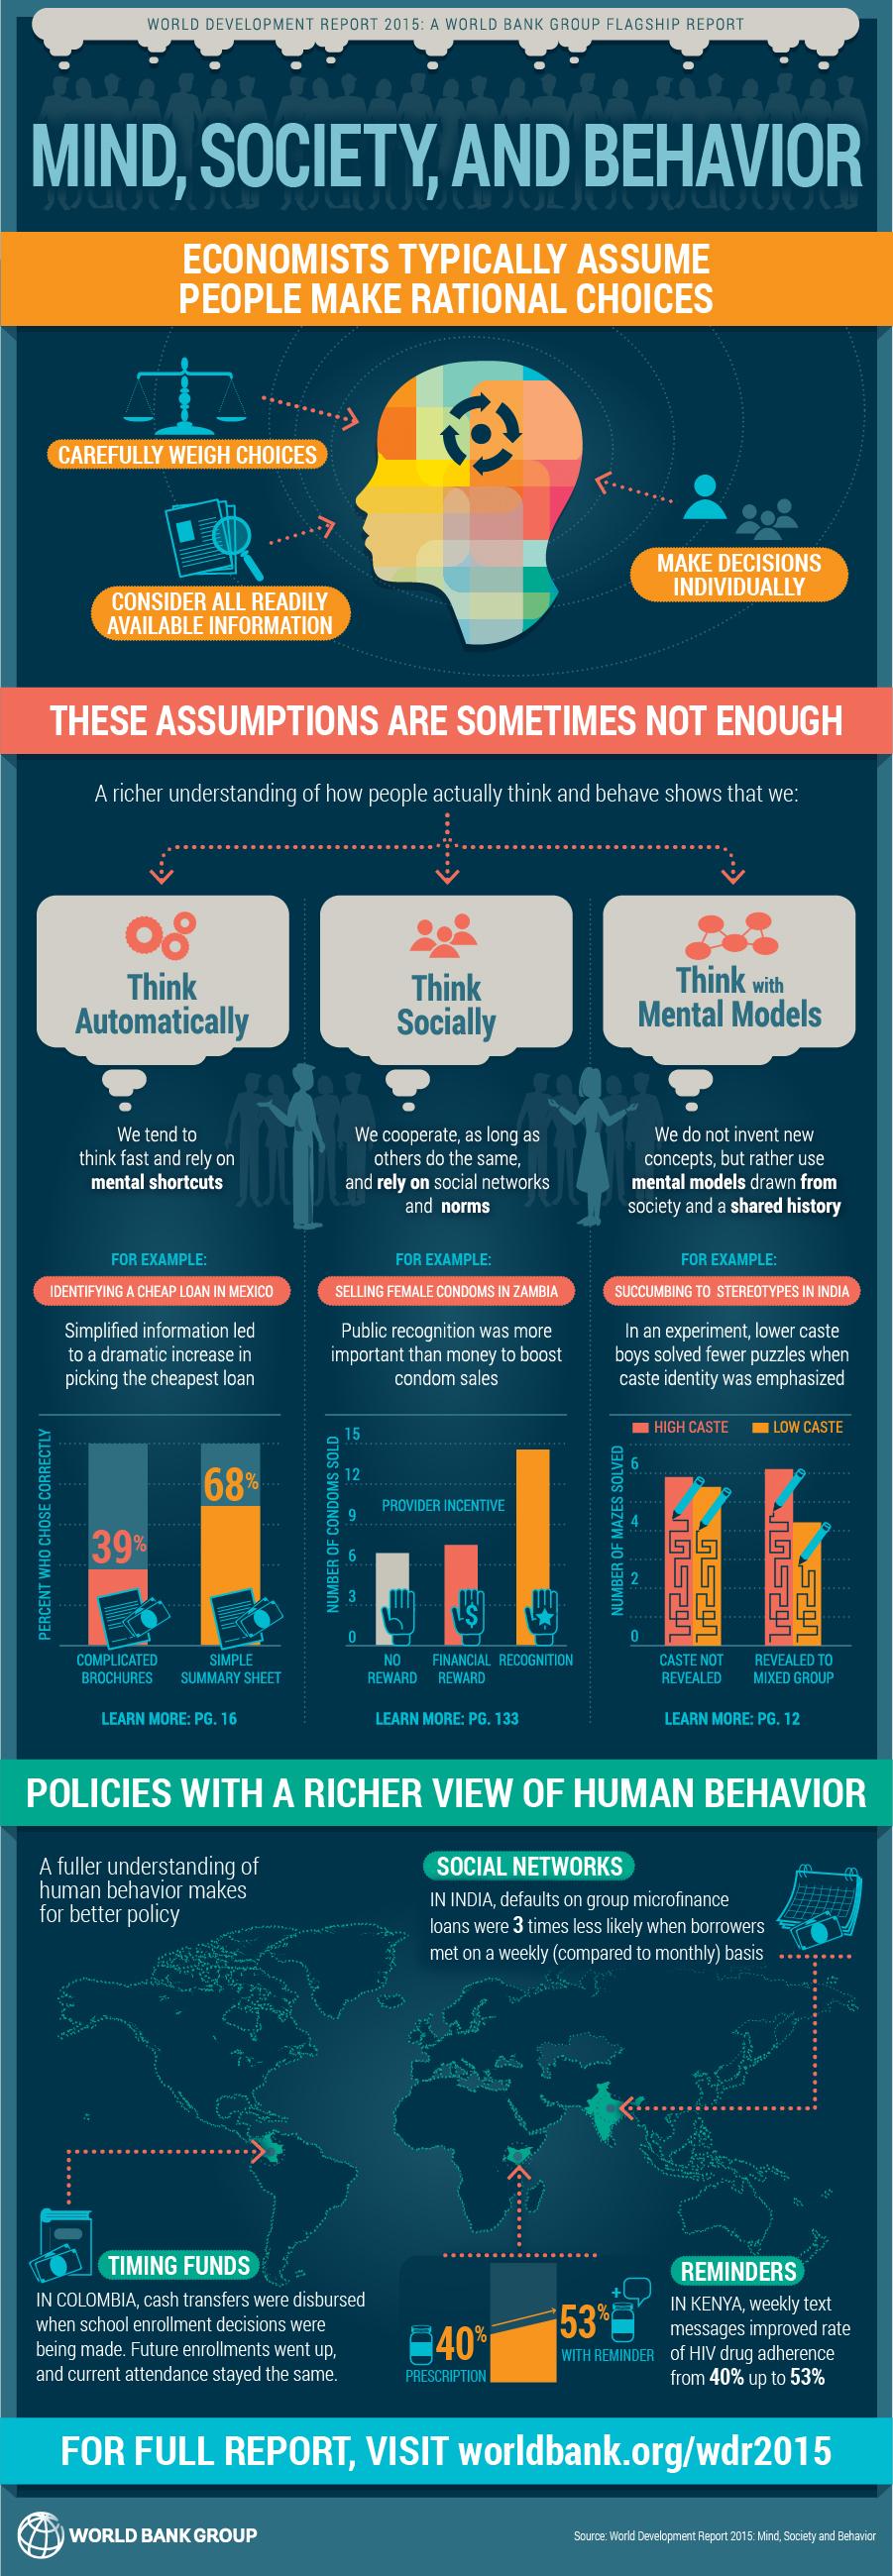 World Bank infographic summarising the World Development Report